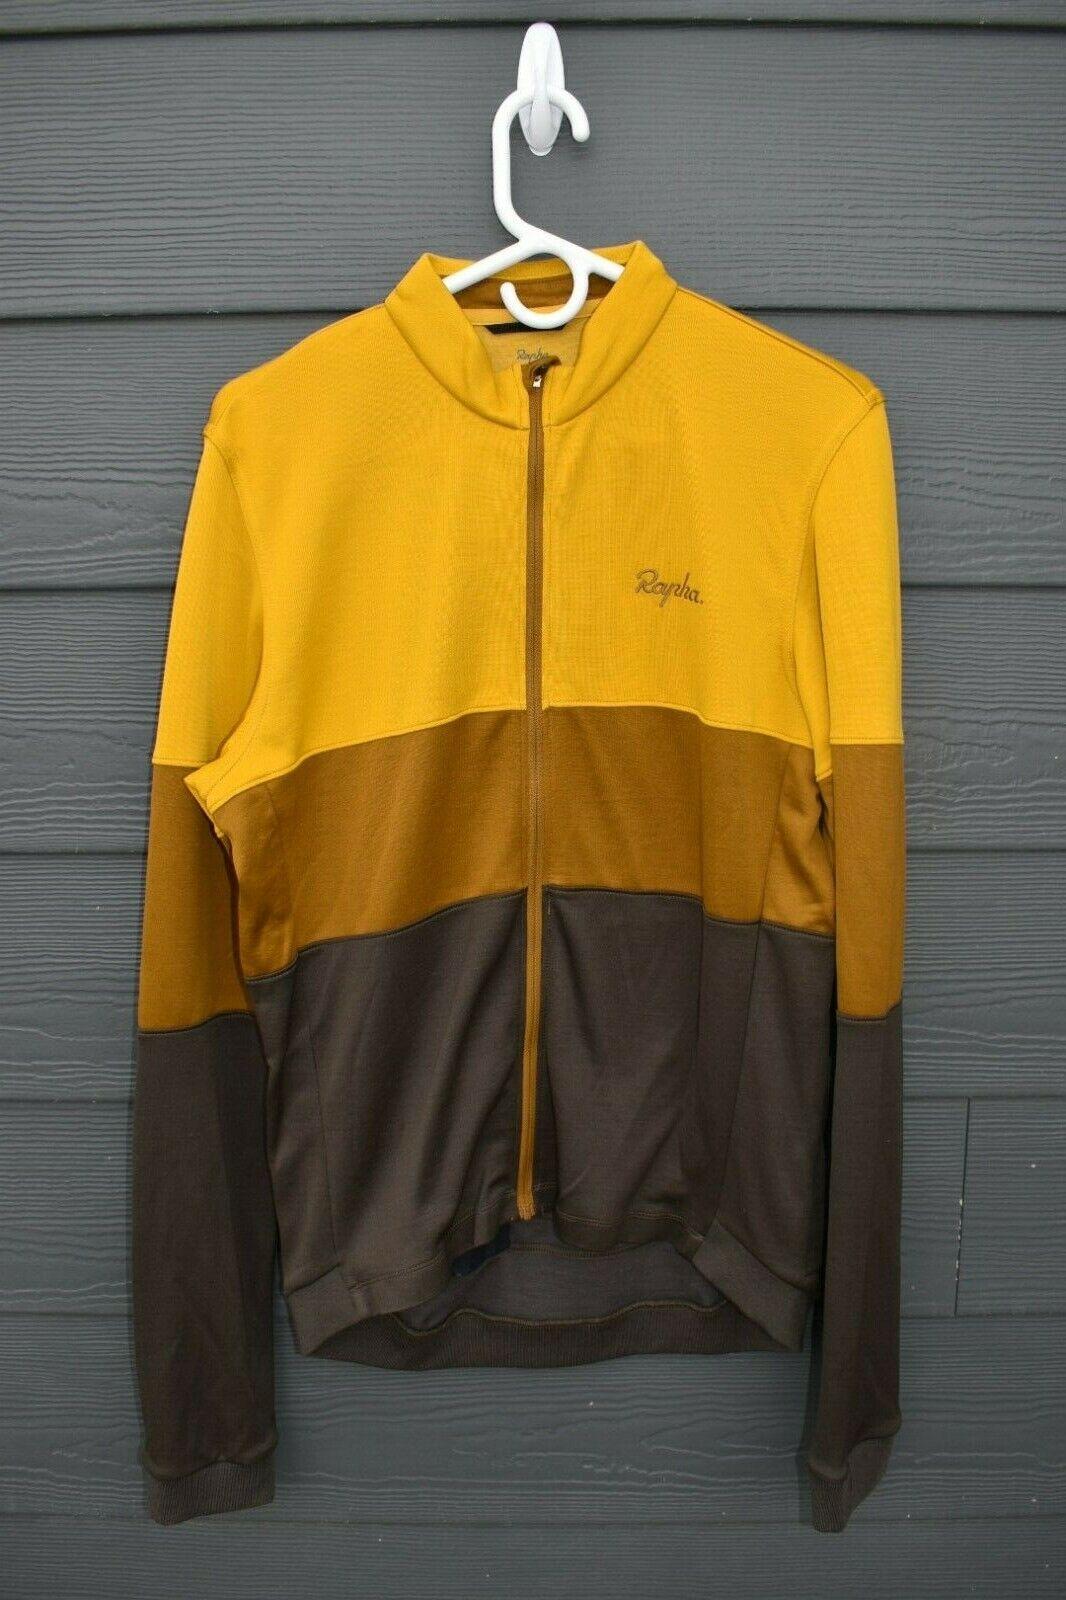 Rapha Short Sleeve Tricolour Jersey Grey Sizes Medium /& Large BNWT